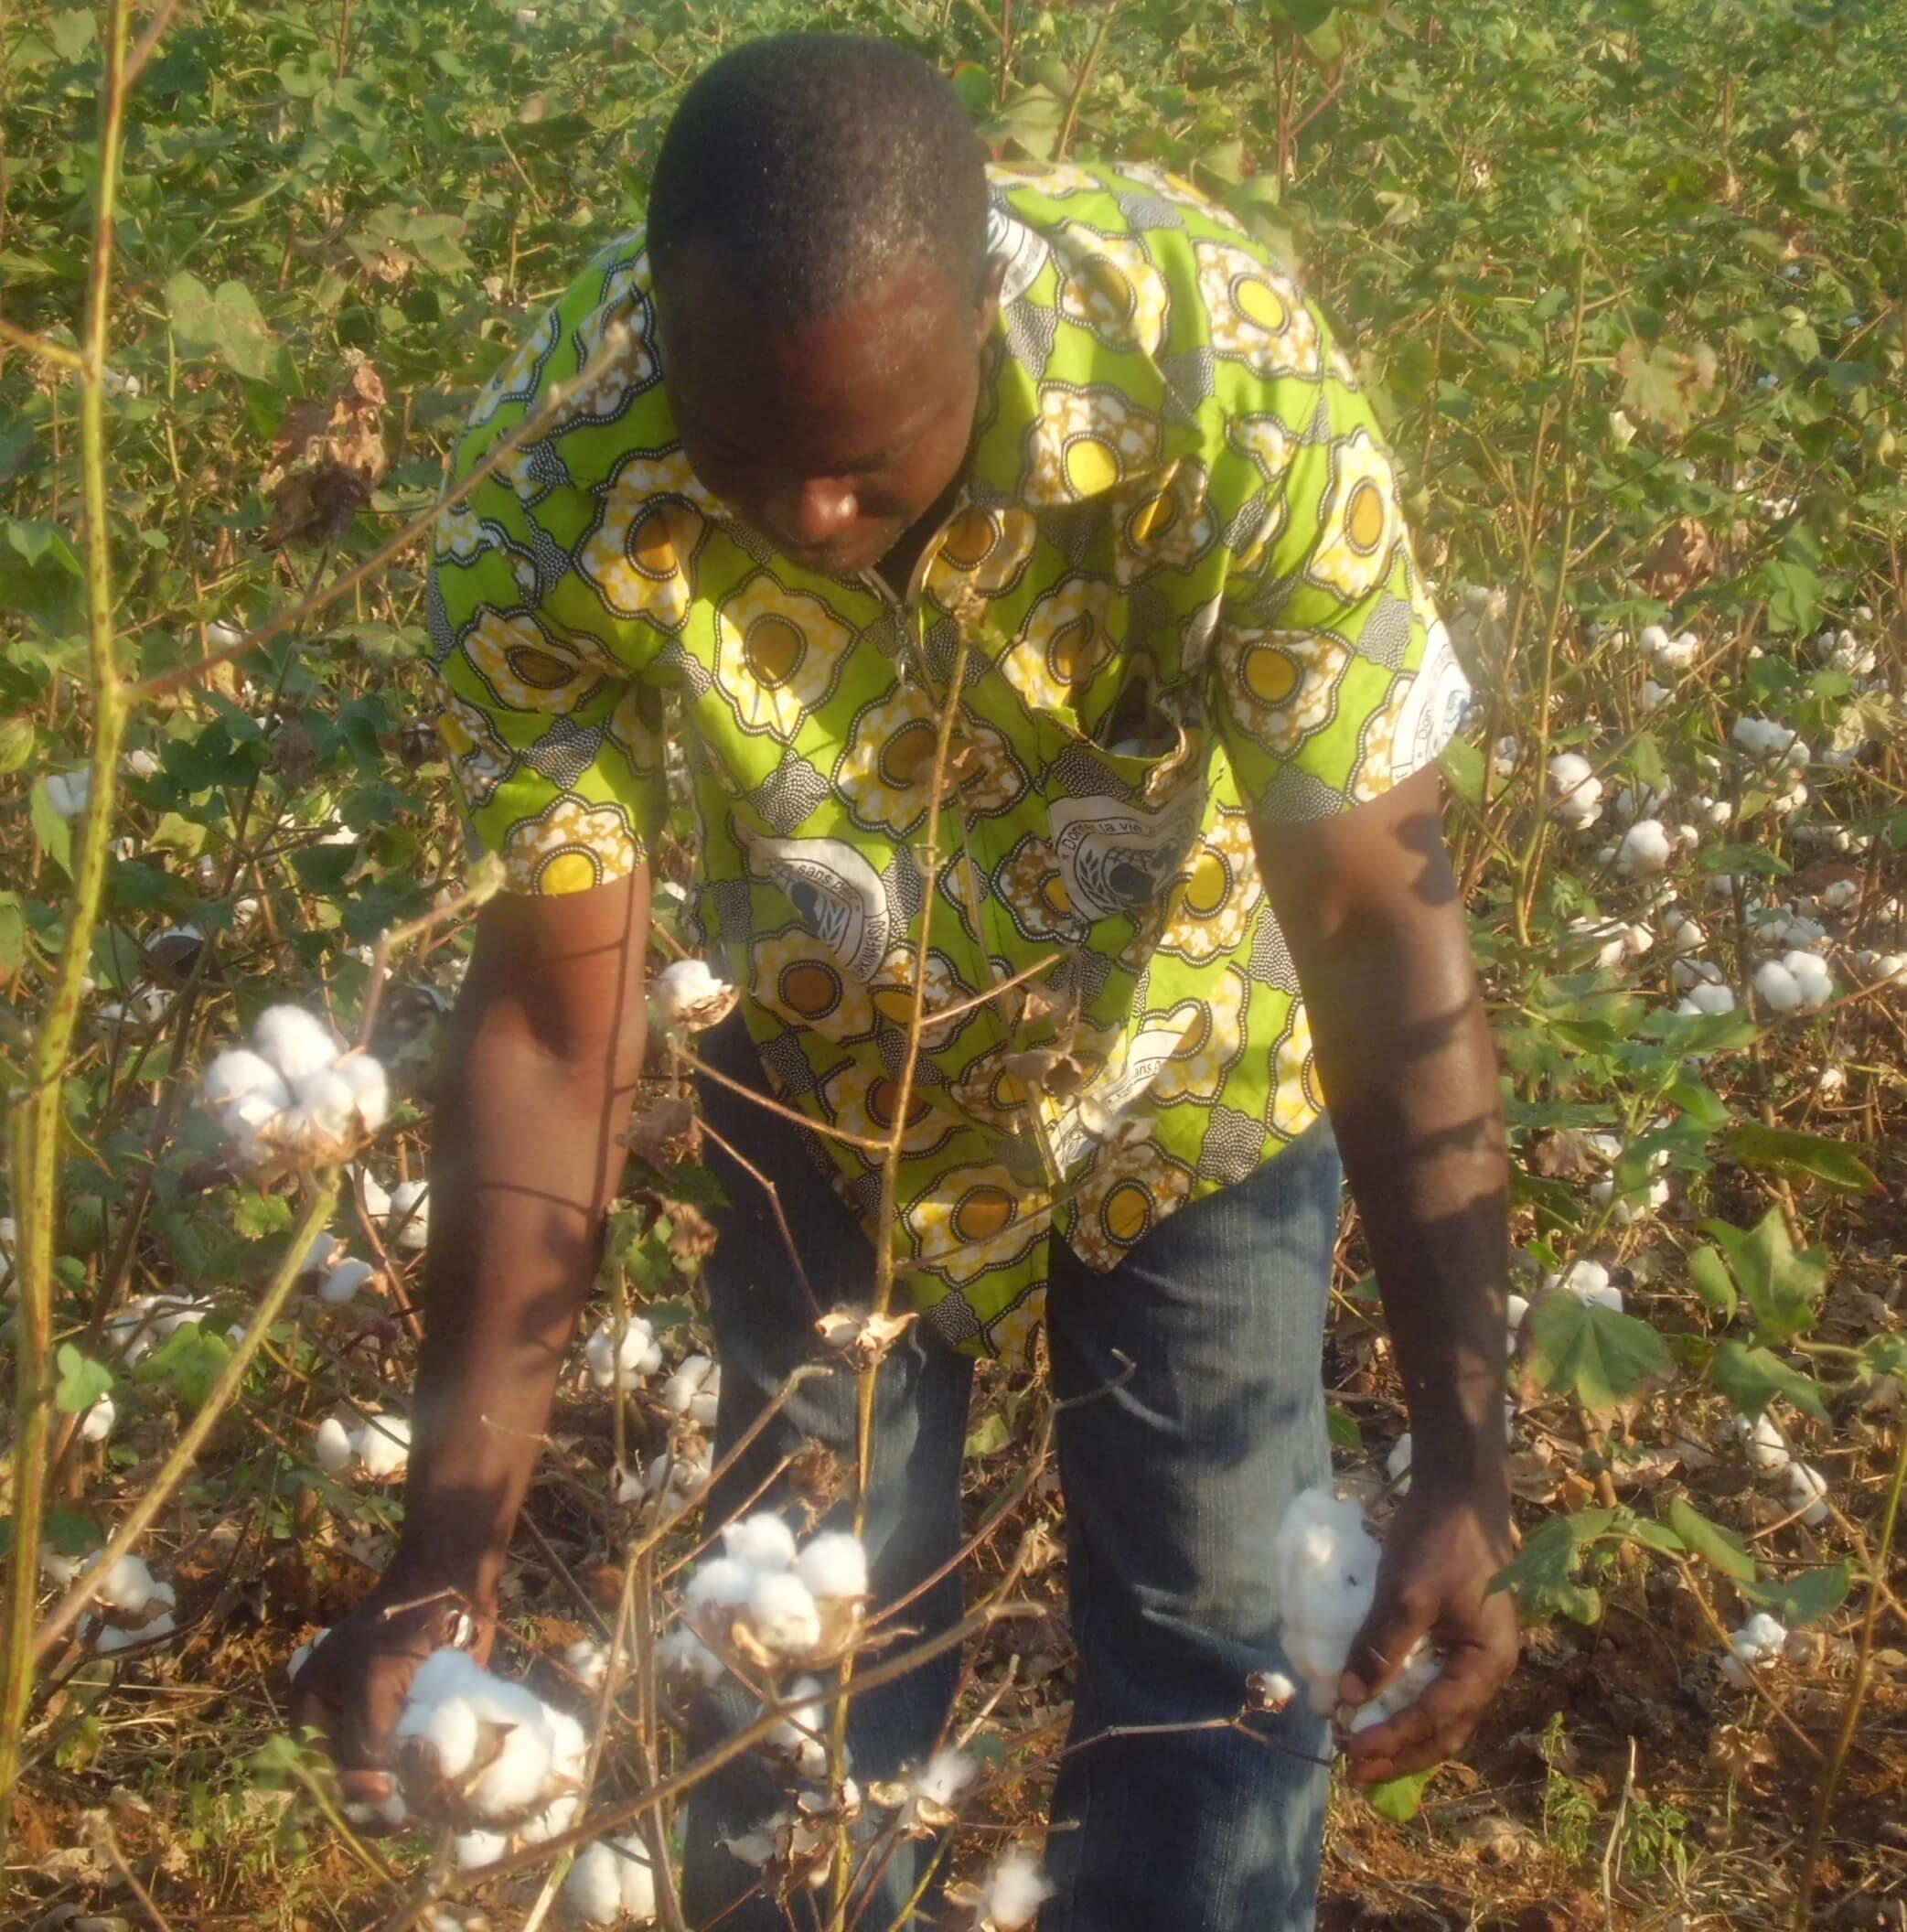 GM Cotton2